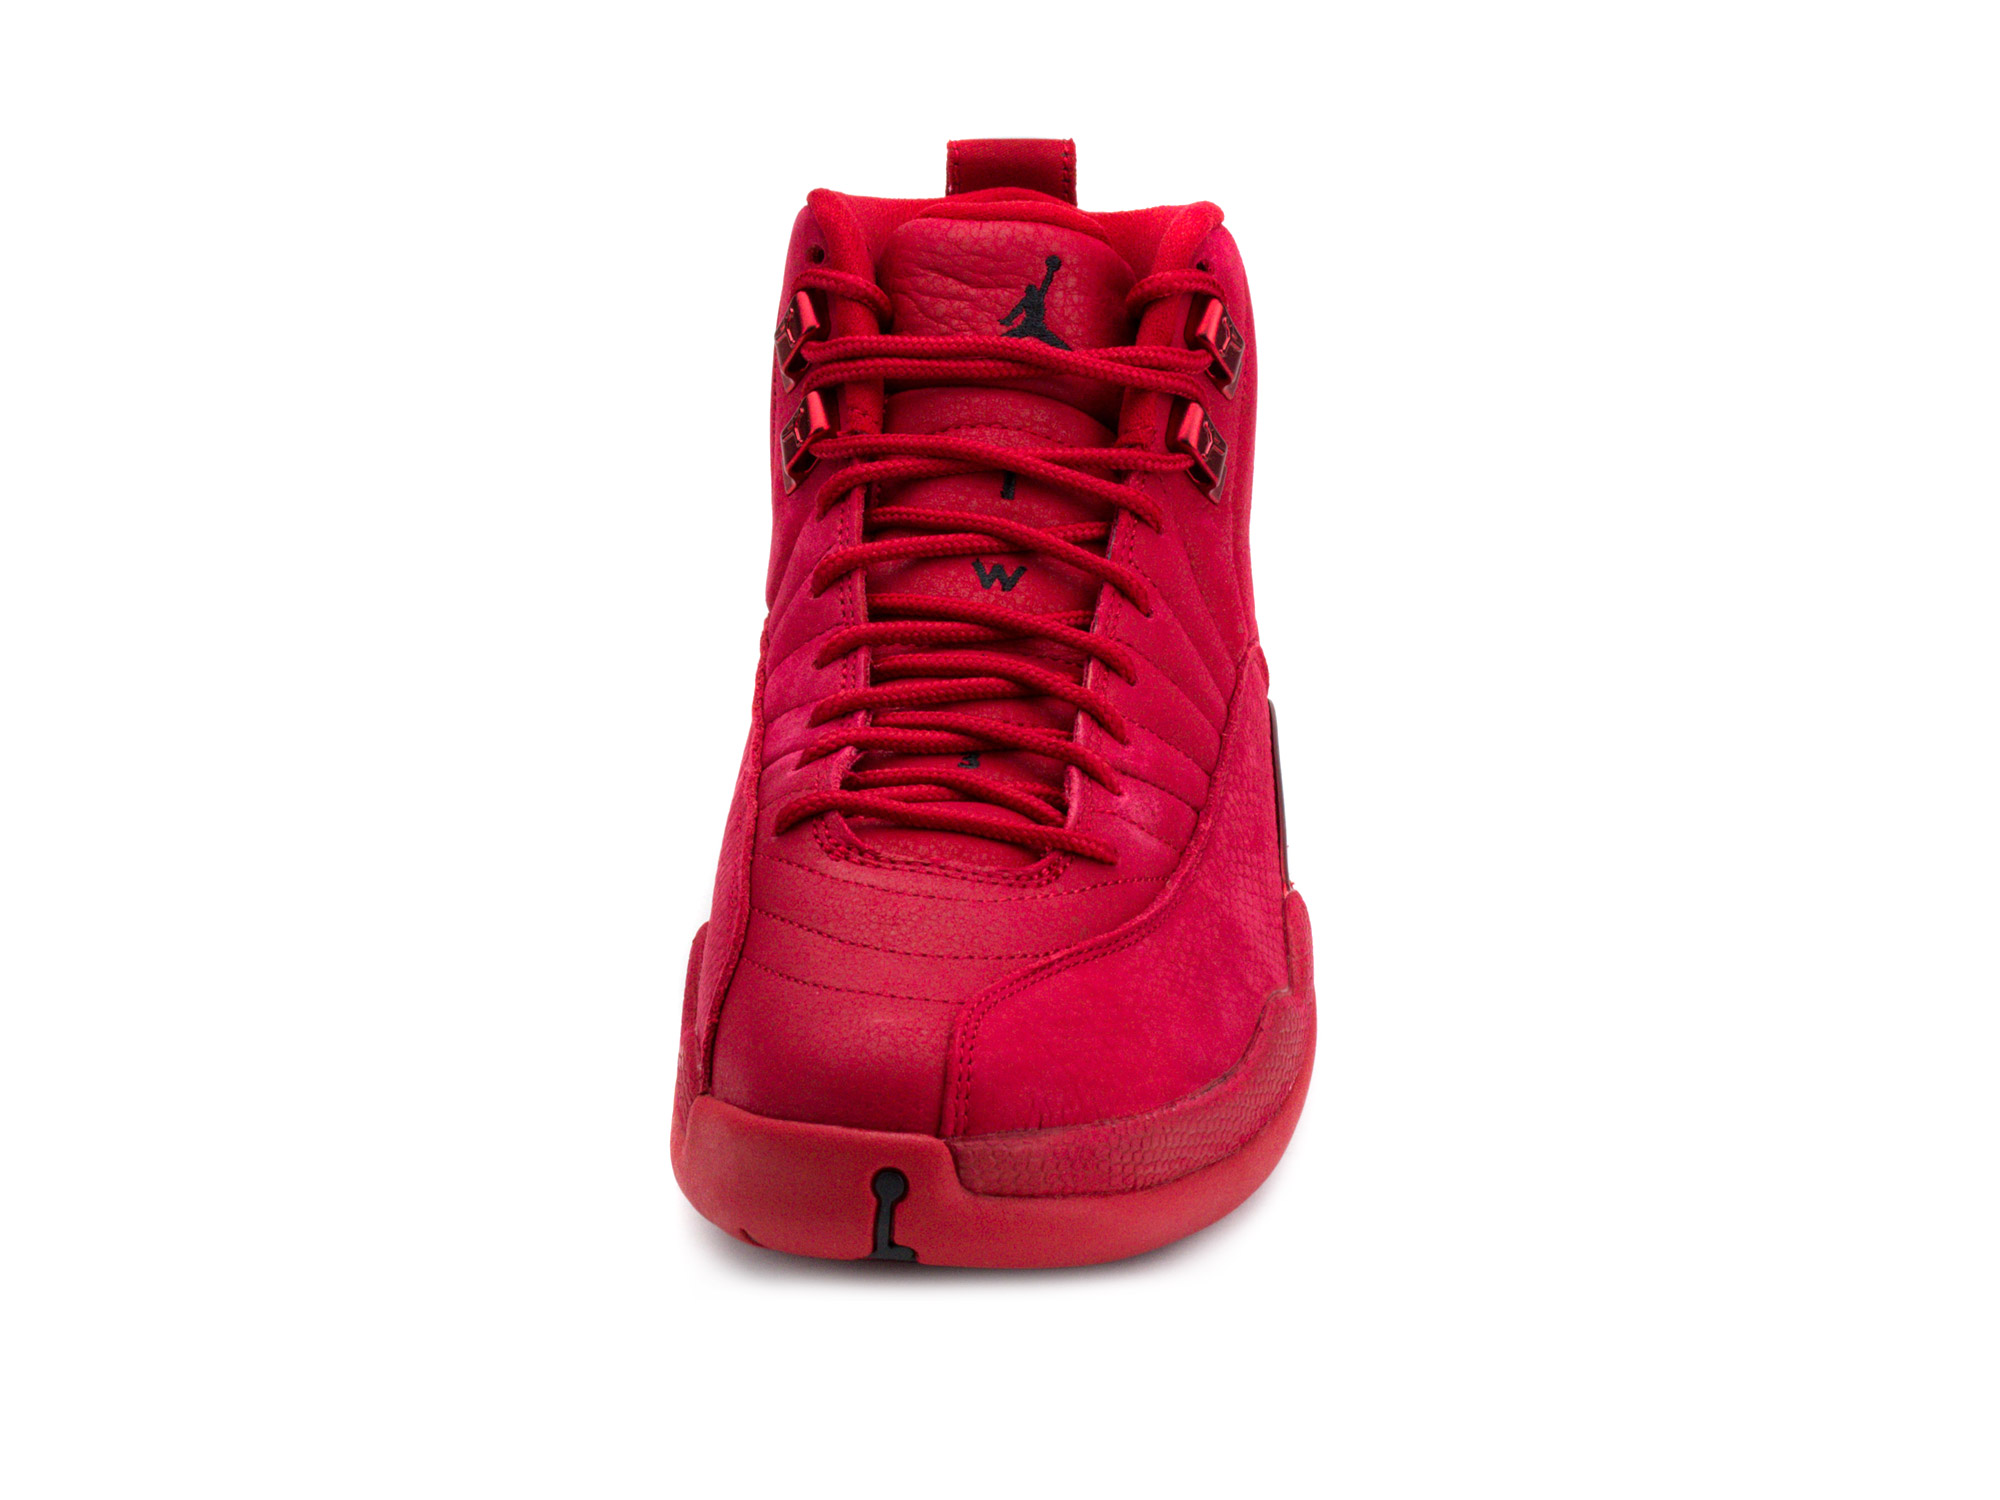 fd1111958833d2 Nike Mens Air Jordan 12 Retro Gym Red Black 130690-601